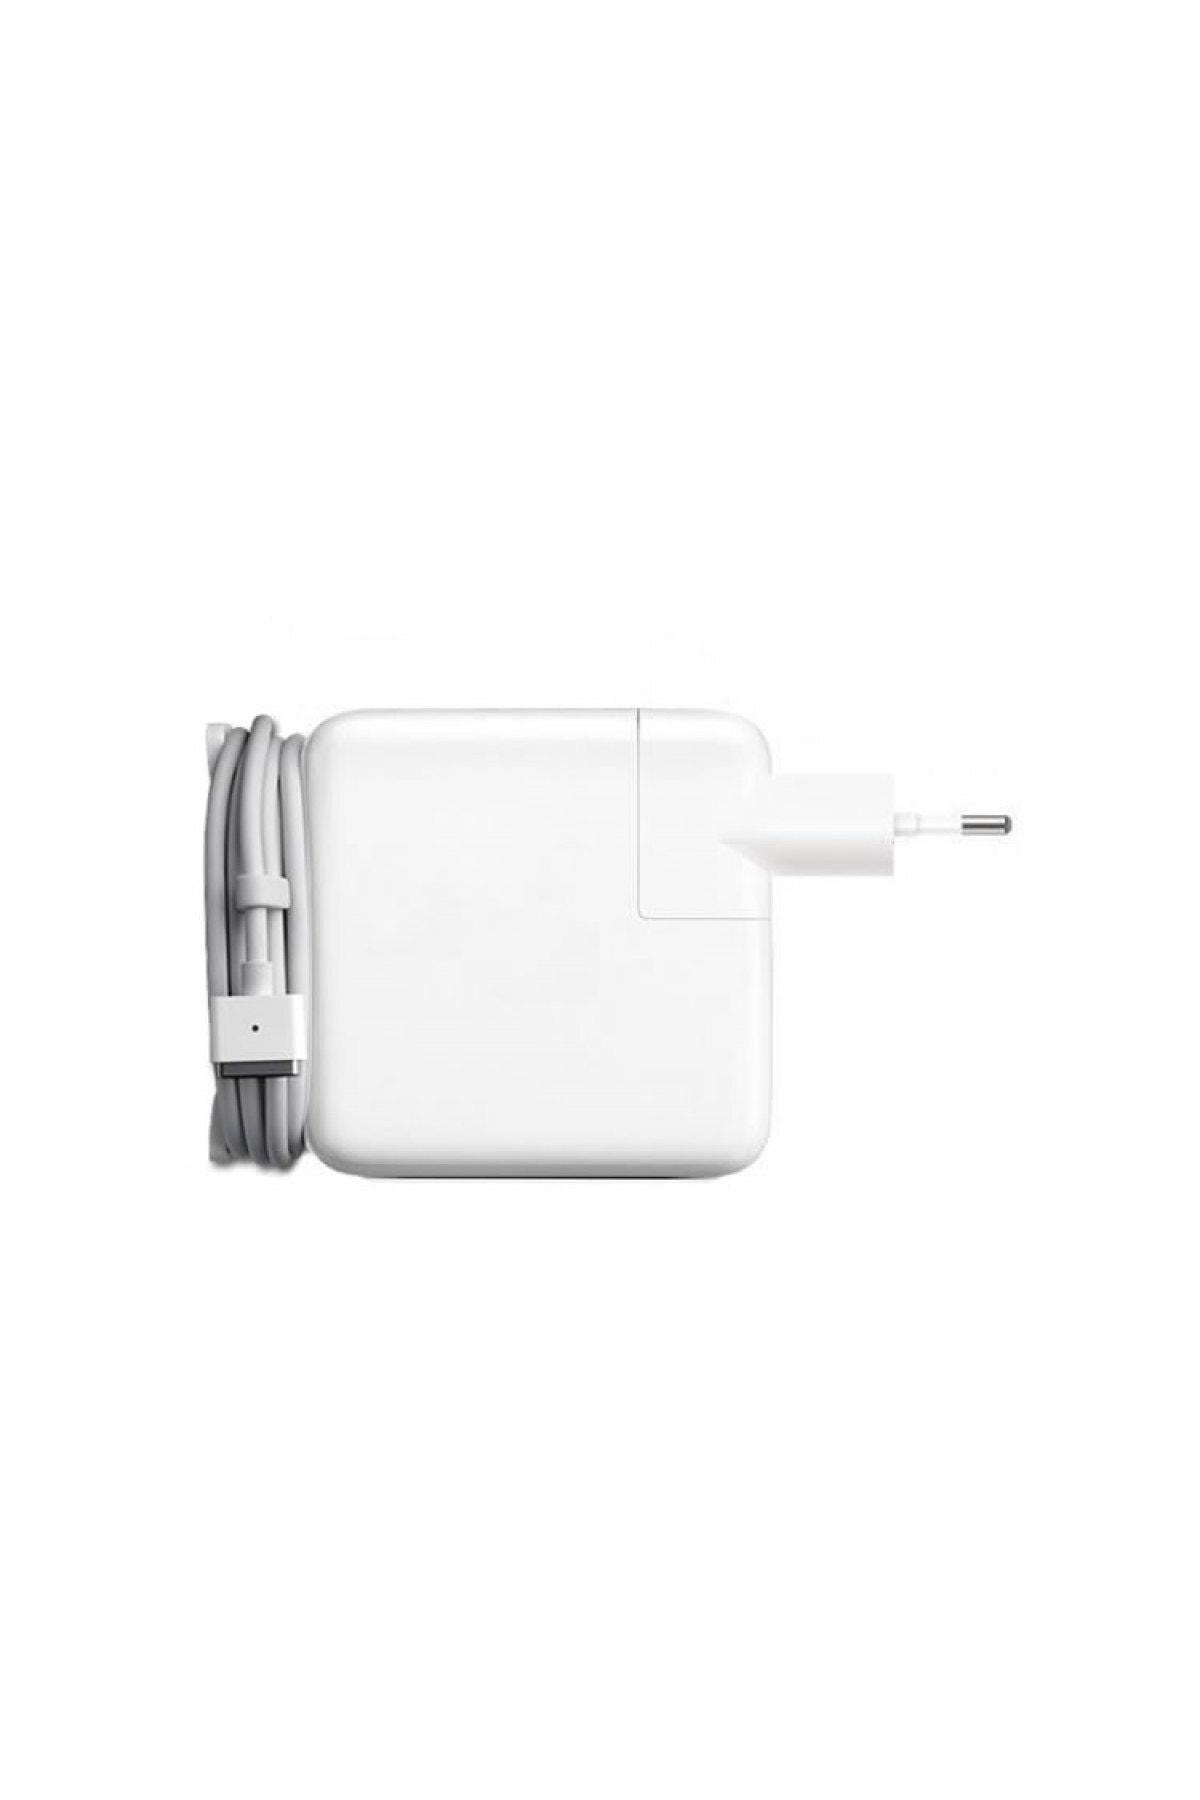 İnfomax Macbook Air A1465 Adaptör Şarj Aleti 1